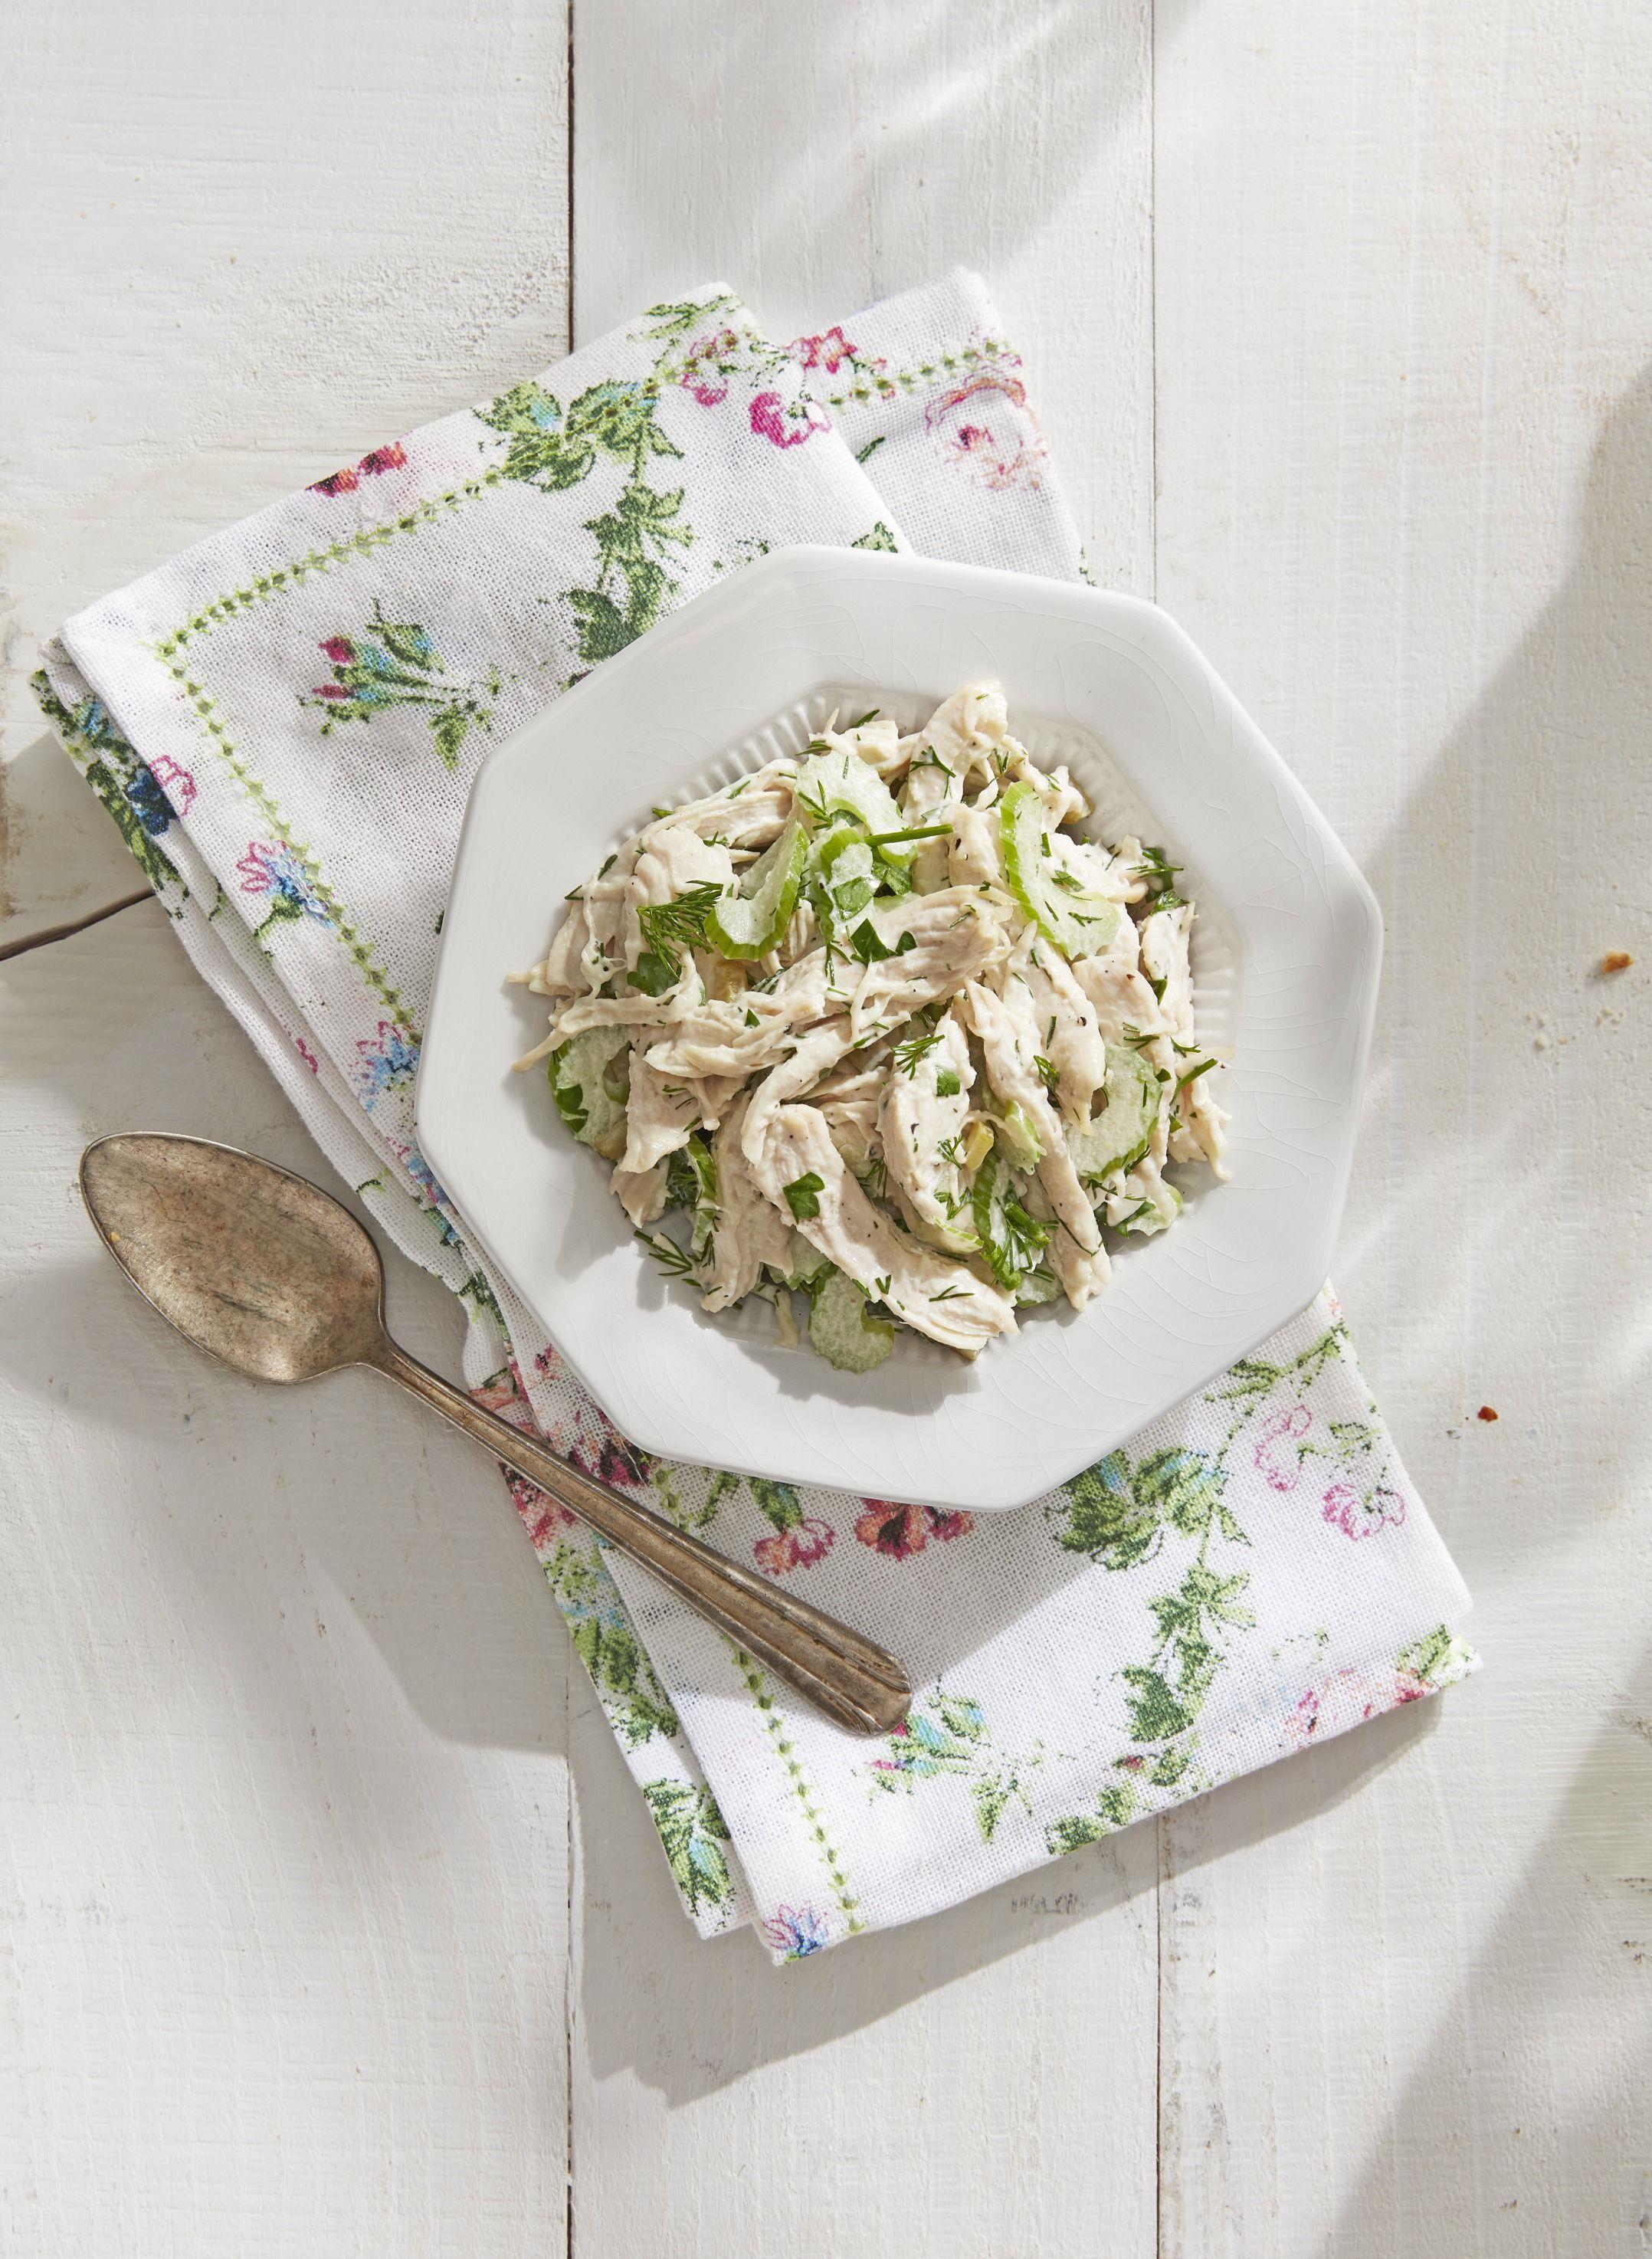 Best Updated Classic Chicken Salad Recipe How To Make Updated Classic Chicken Salad